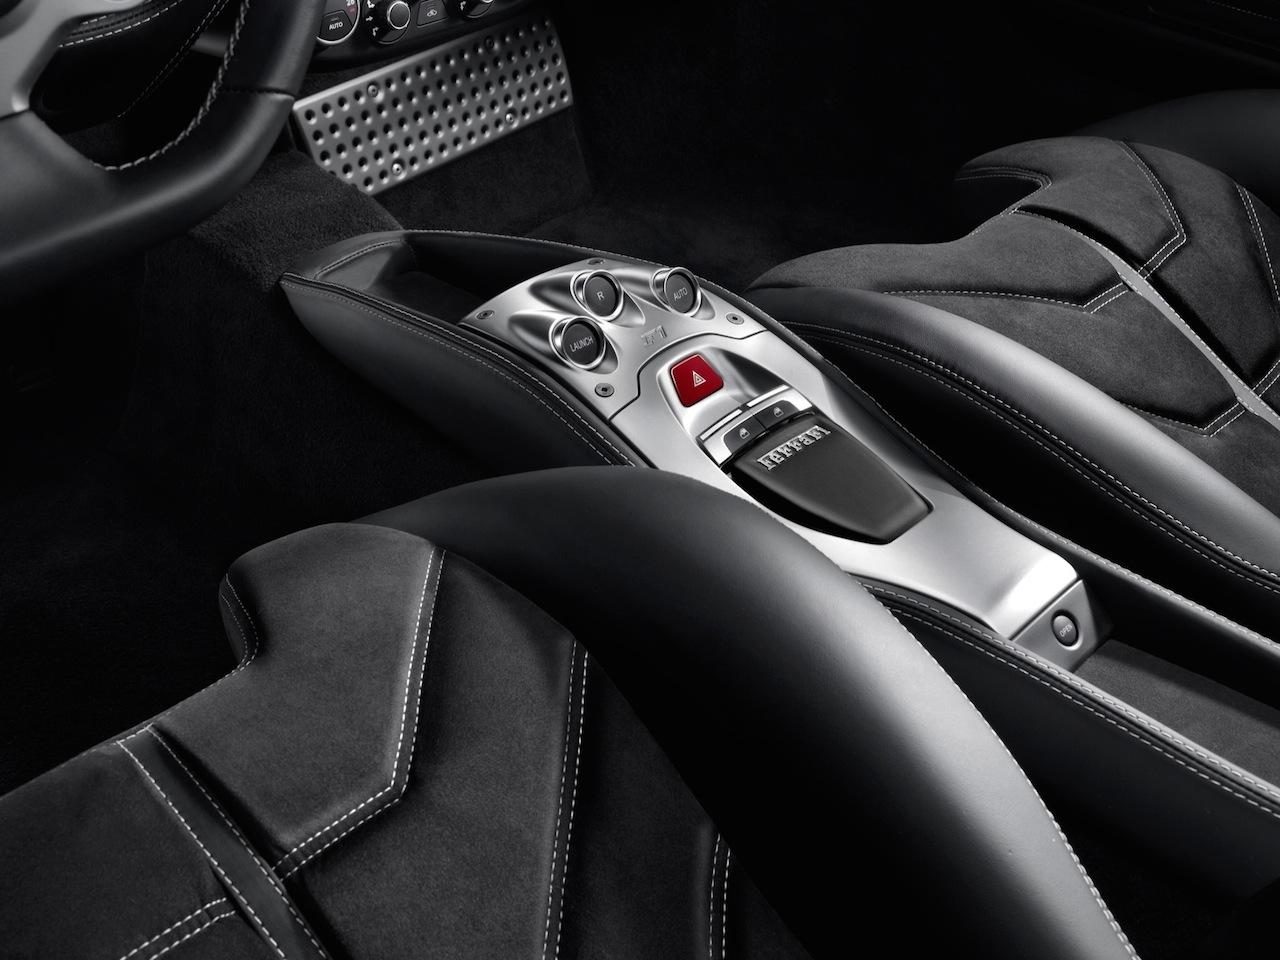 2013 ferrari 458 italia coupe carnow 2013 ferrari 458 italia coupe system controls vanachro Gallery